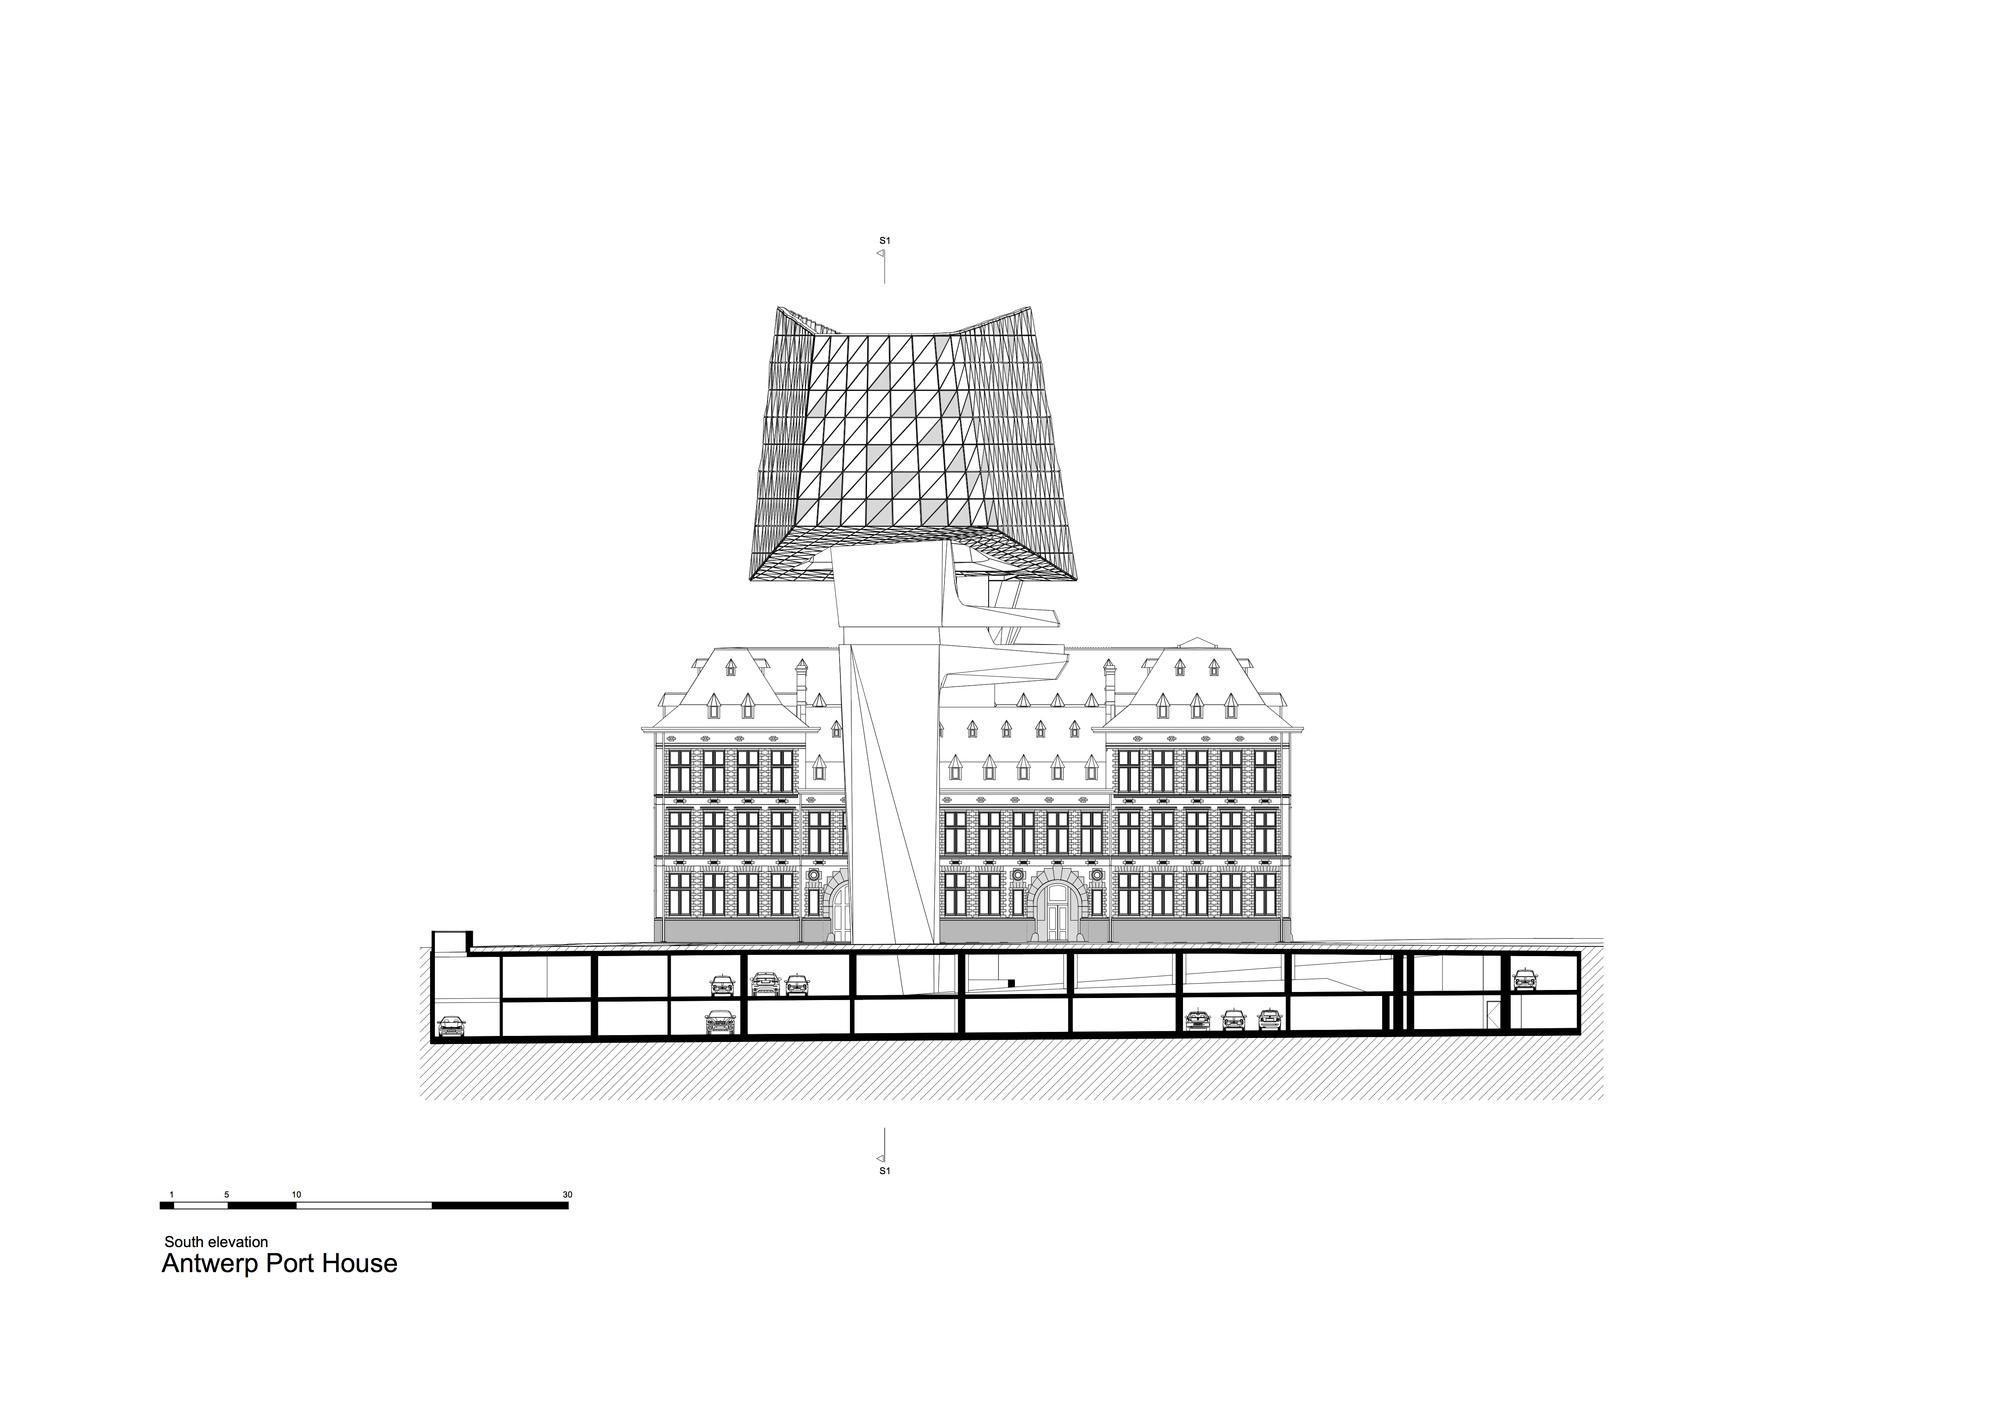 Galeria de edif cio no porto de antu rpia zaha hadid for 4 1 architecture view